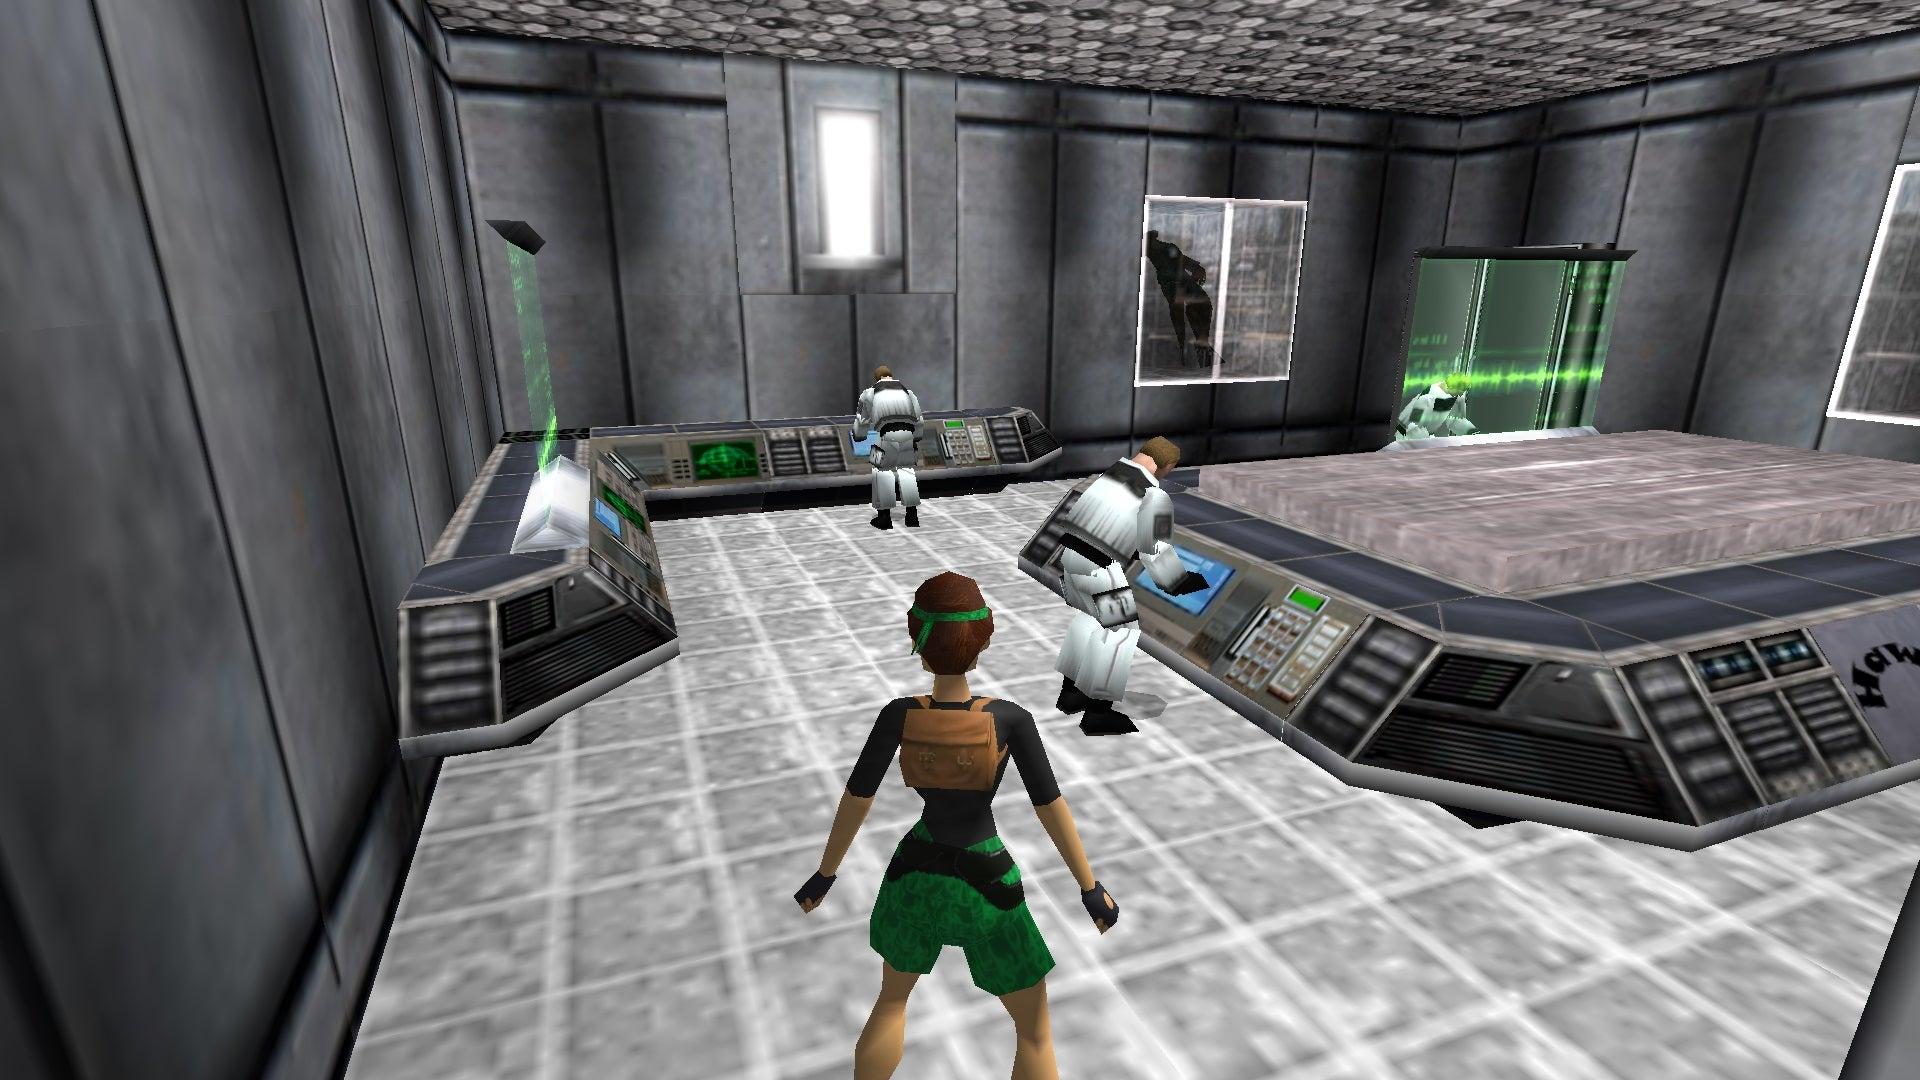 A screenshot from the Tomb Raider custom level called Atlantis 2